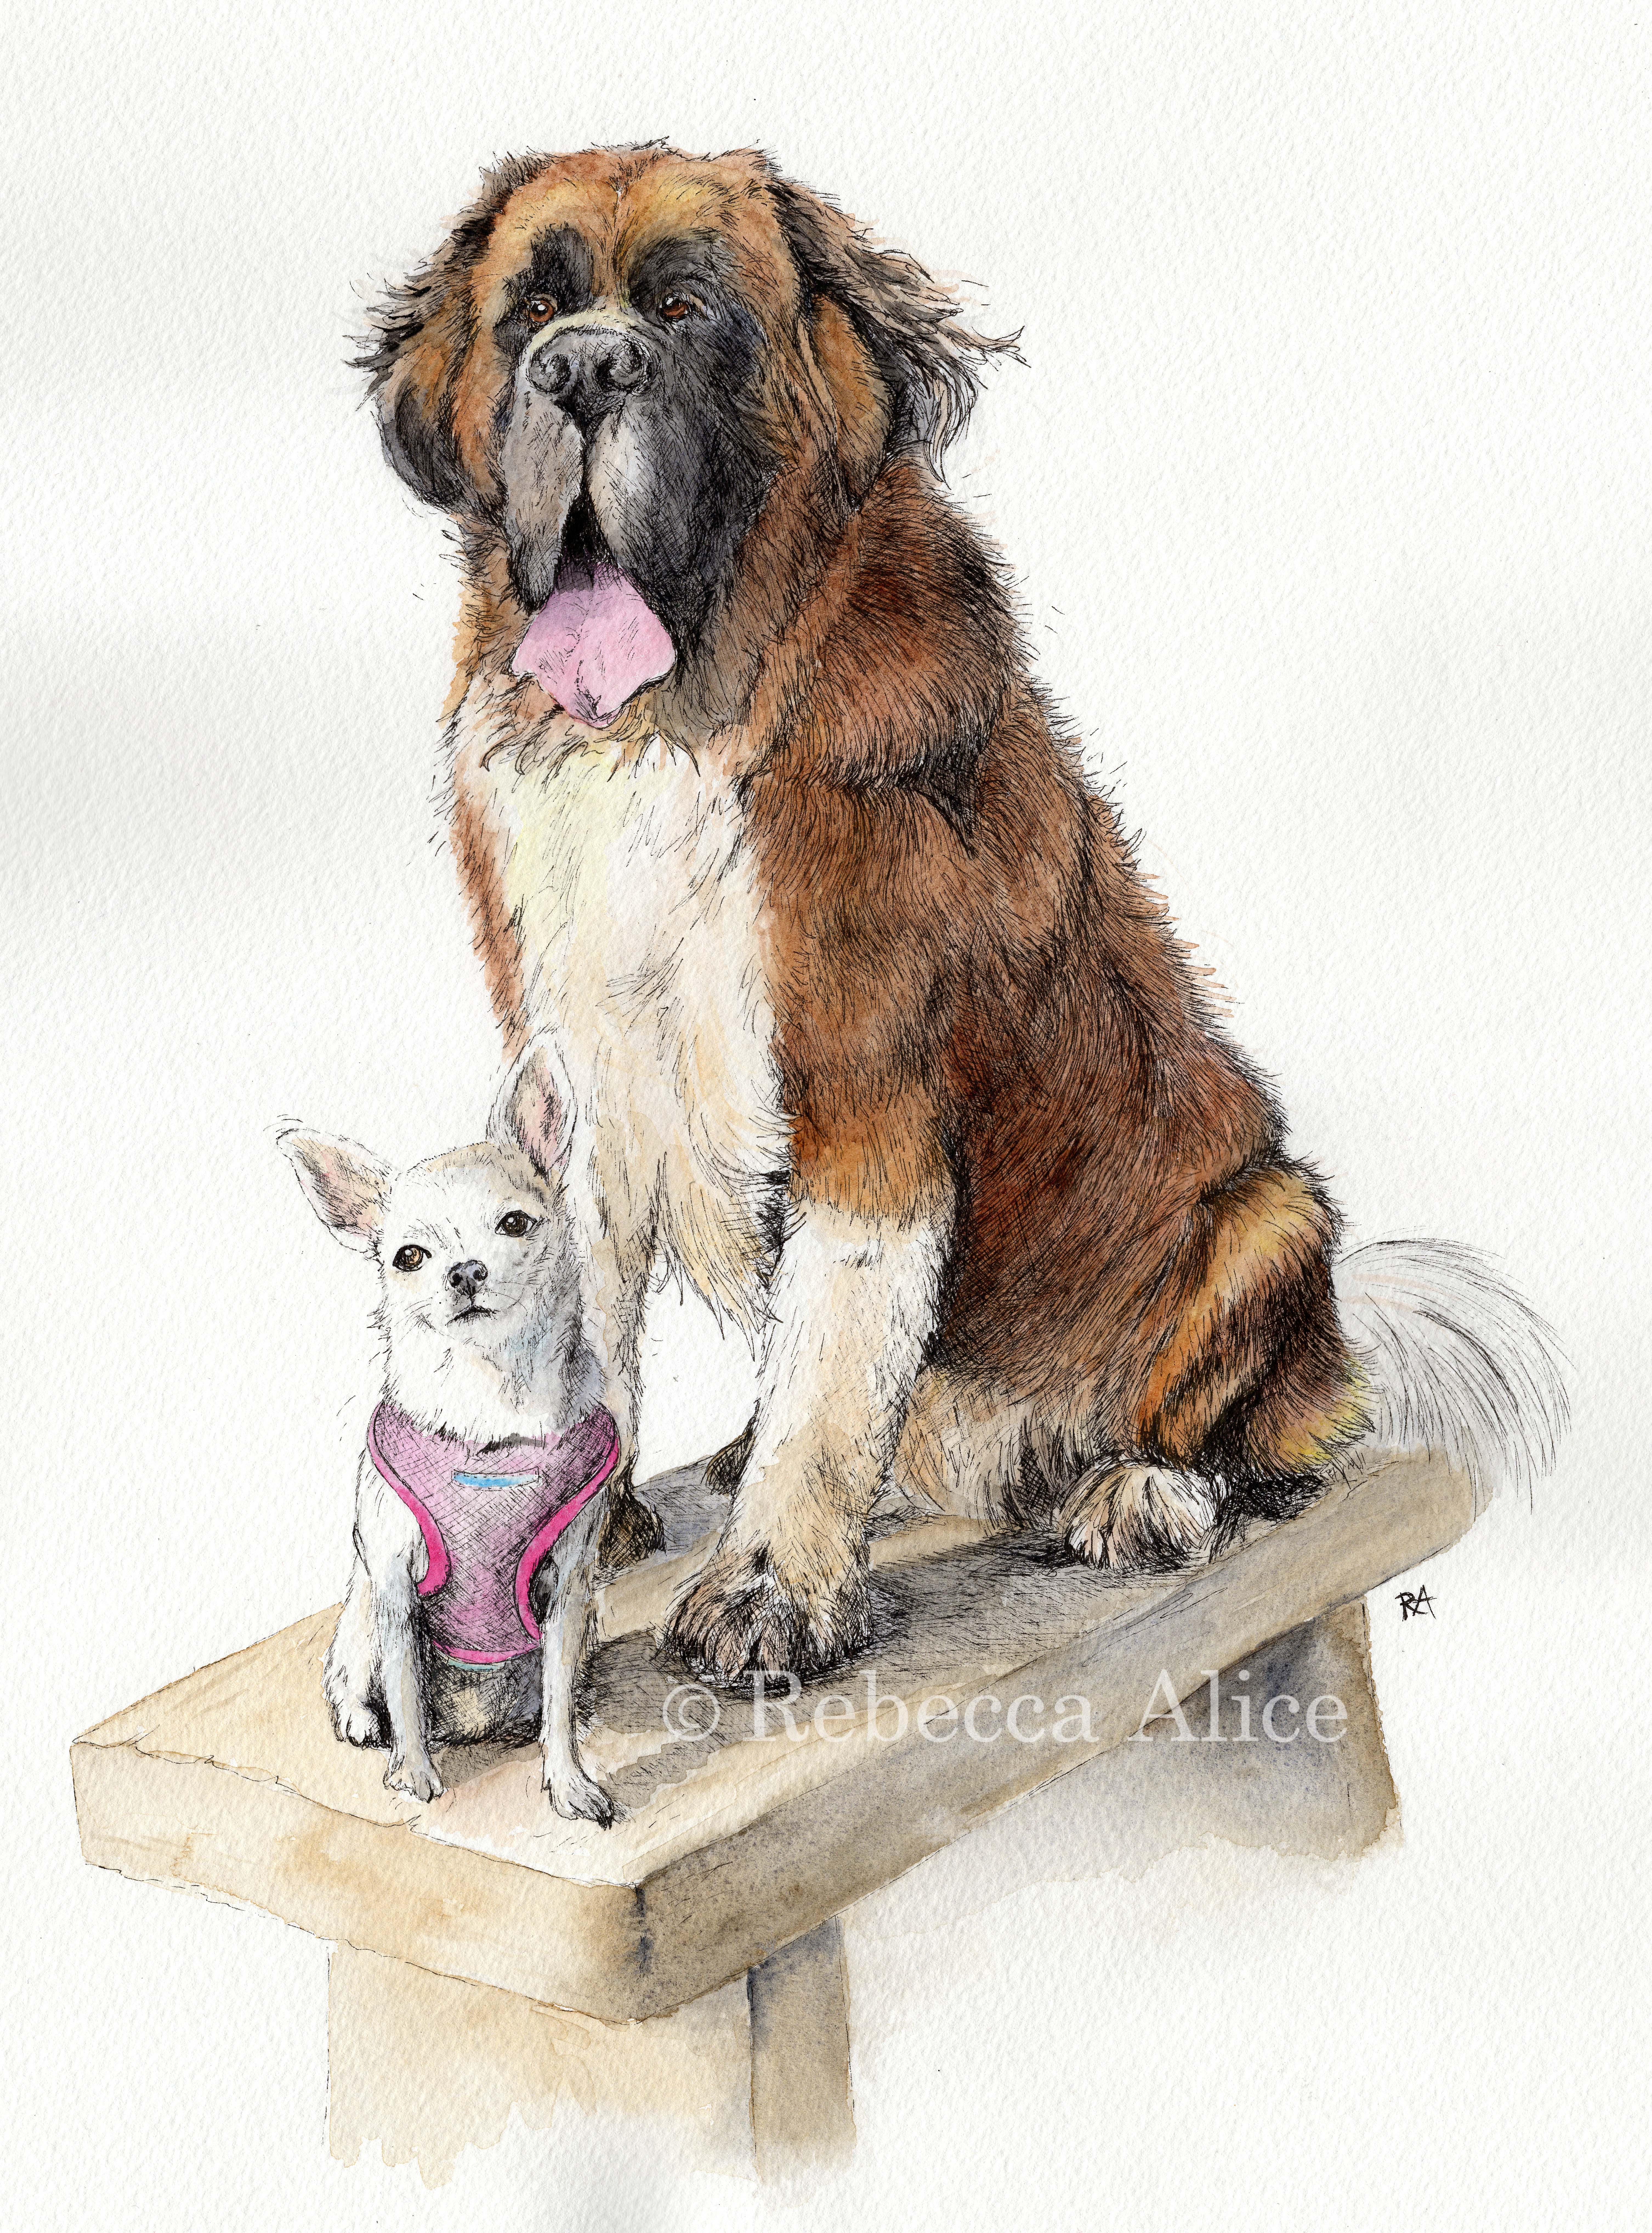 Maxi and Bambini